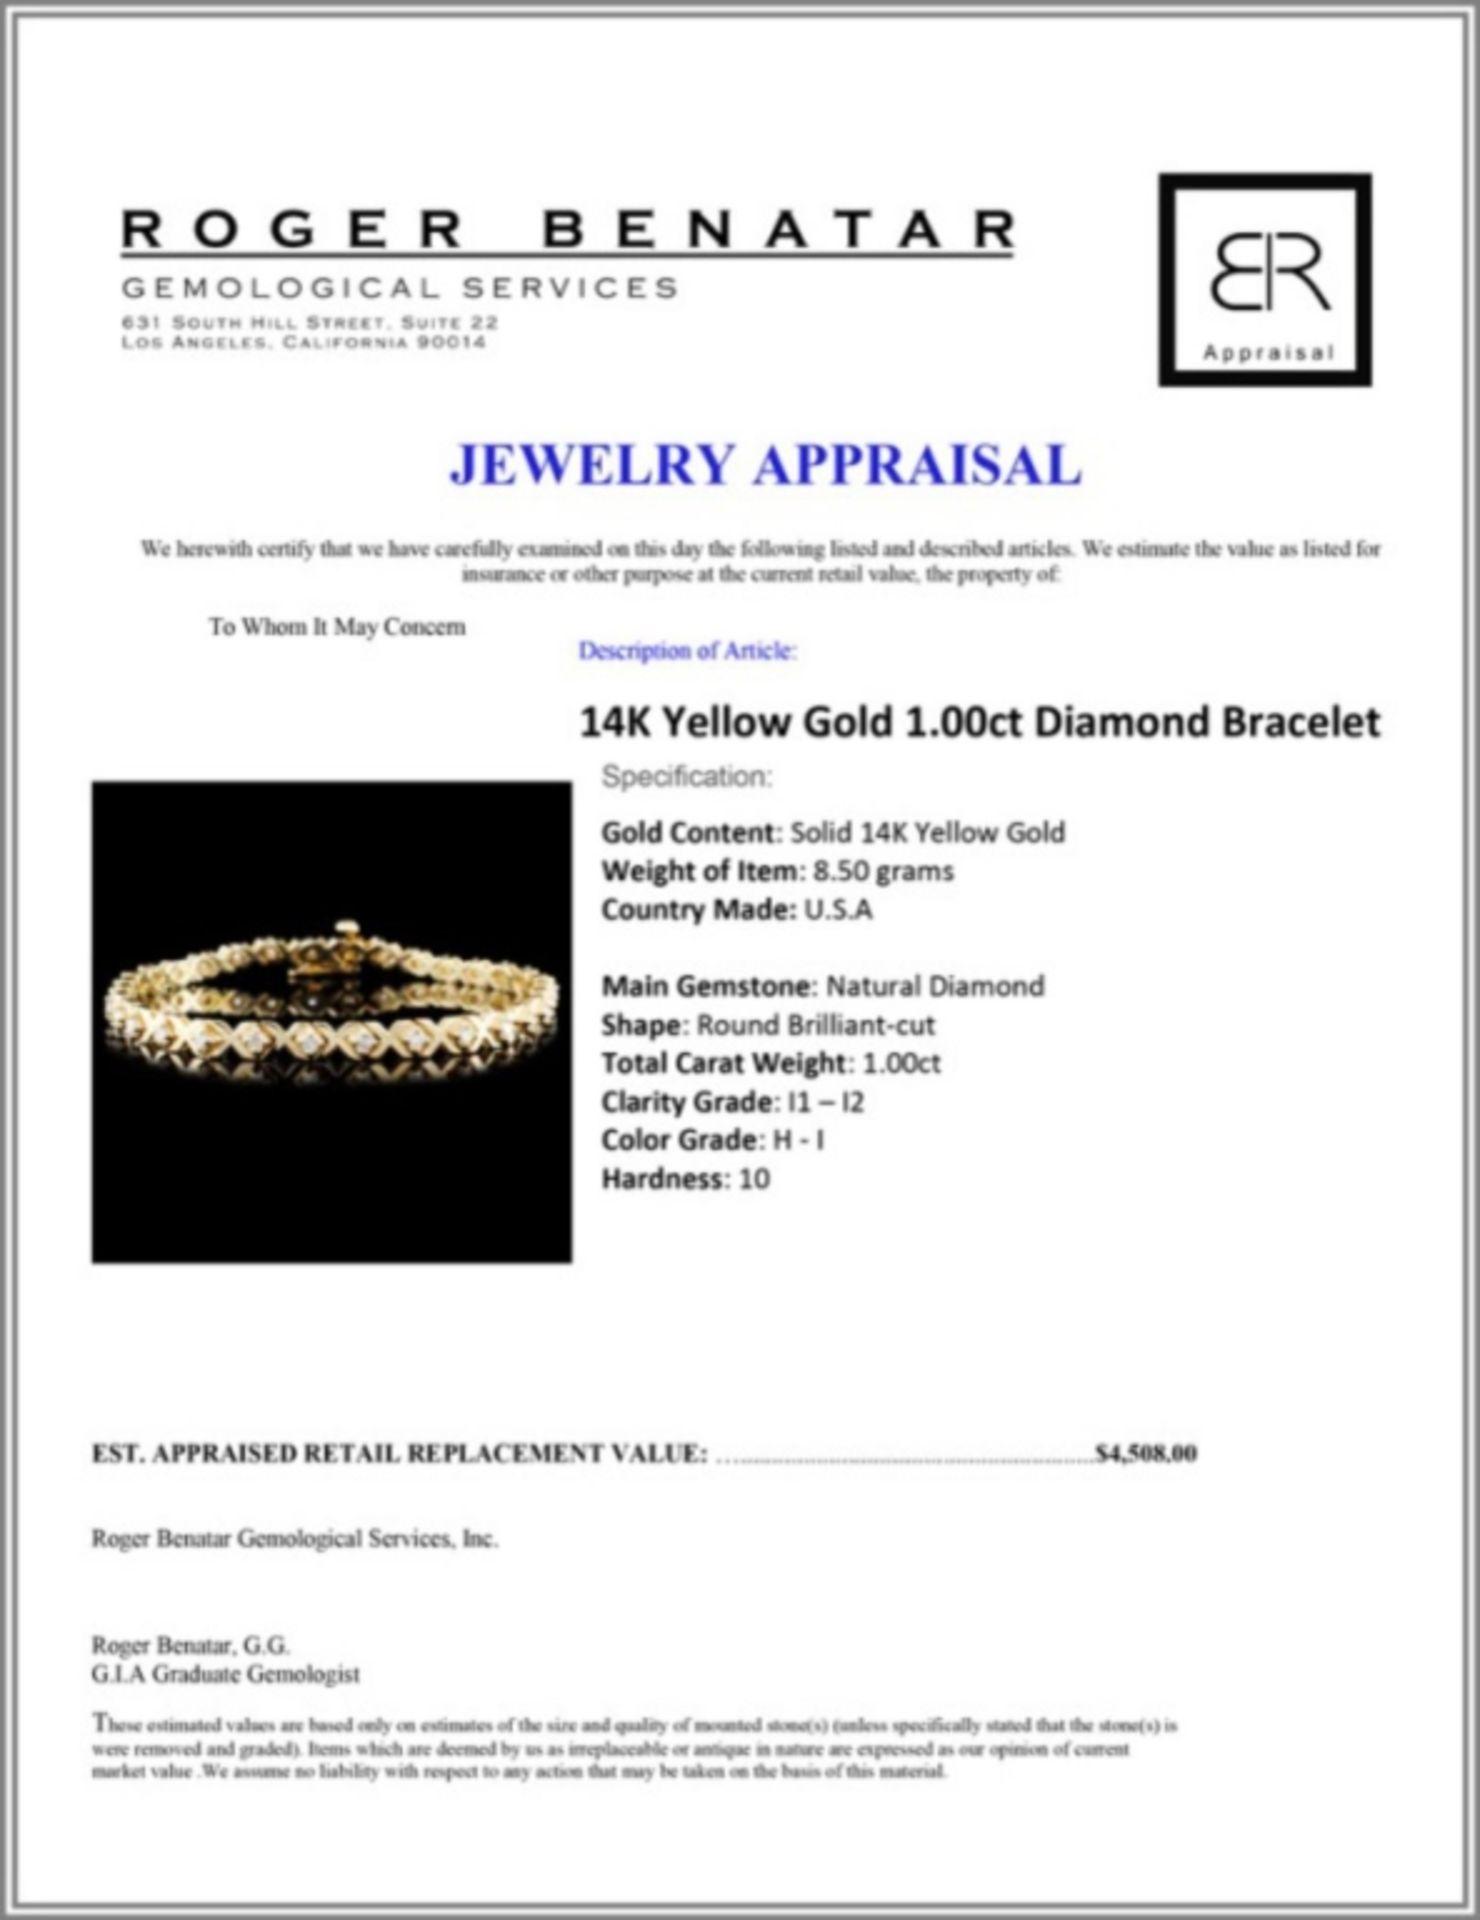 14K Yellow Gold 1.00ct Diamond Bracelet - Image 3 of 3